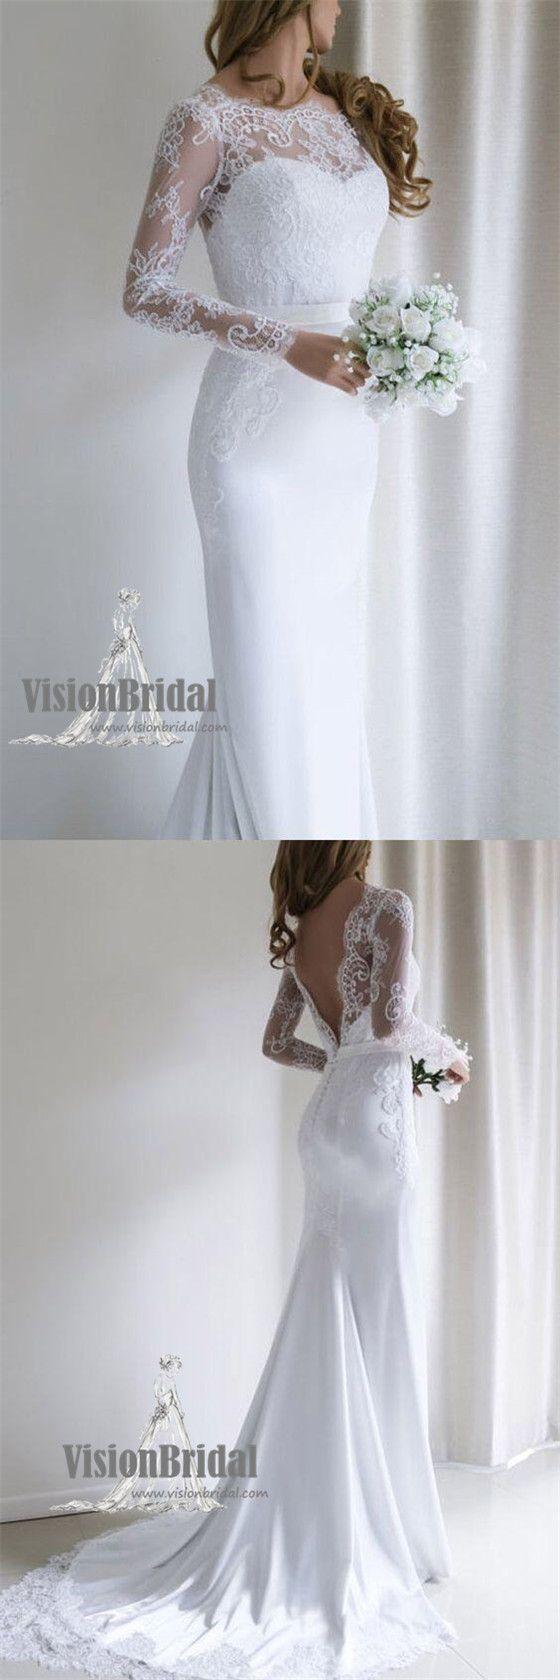 Long wedding dress  Simple Scoop Neckline Top Lace Covered Button VBack ALine Long